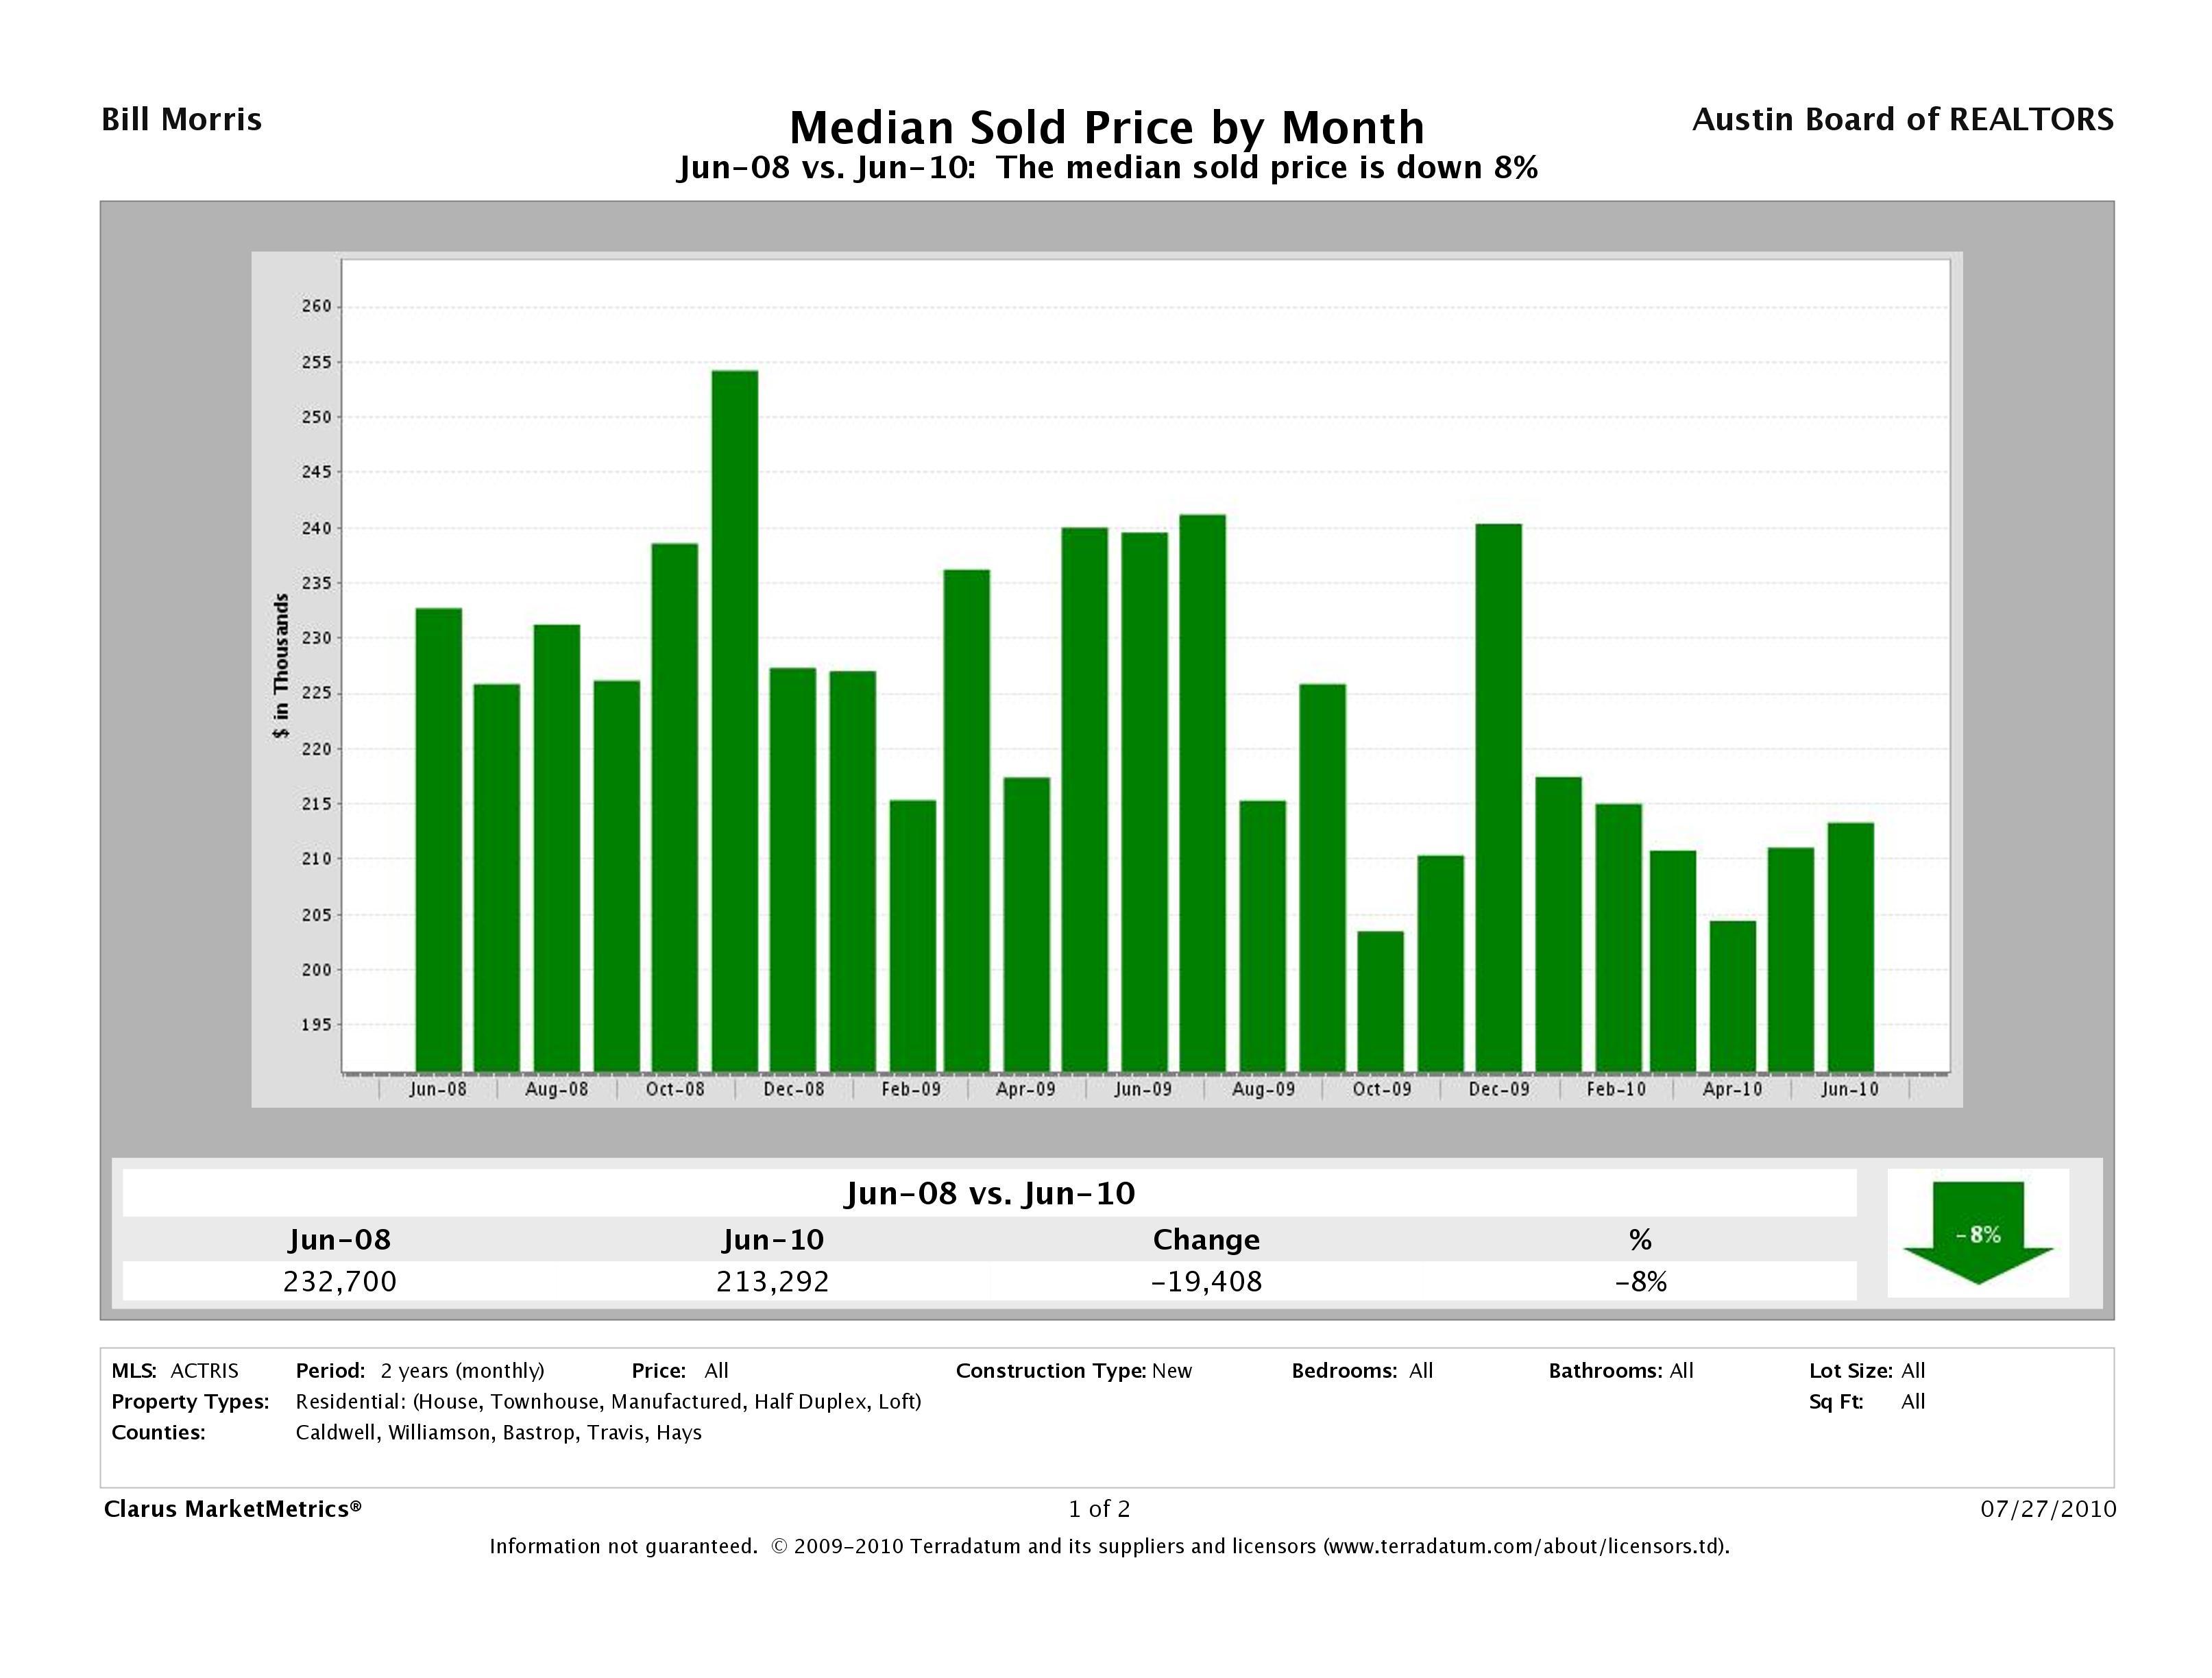 Austin Median New Home Prices June 2008 - June 2010